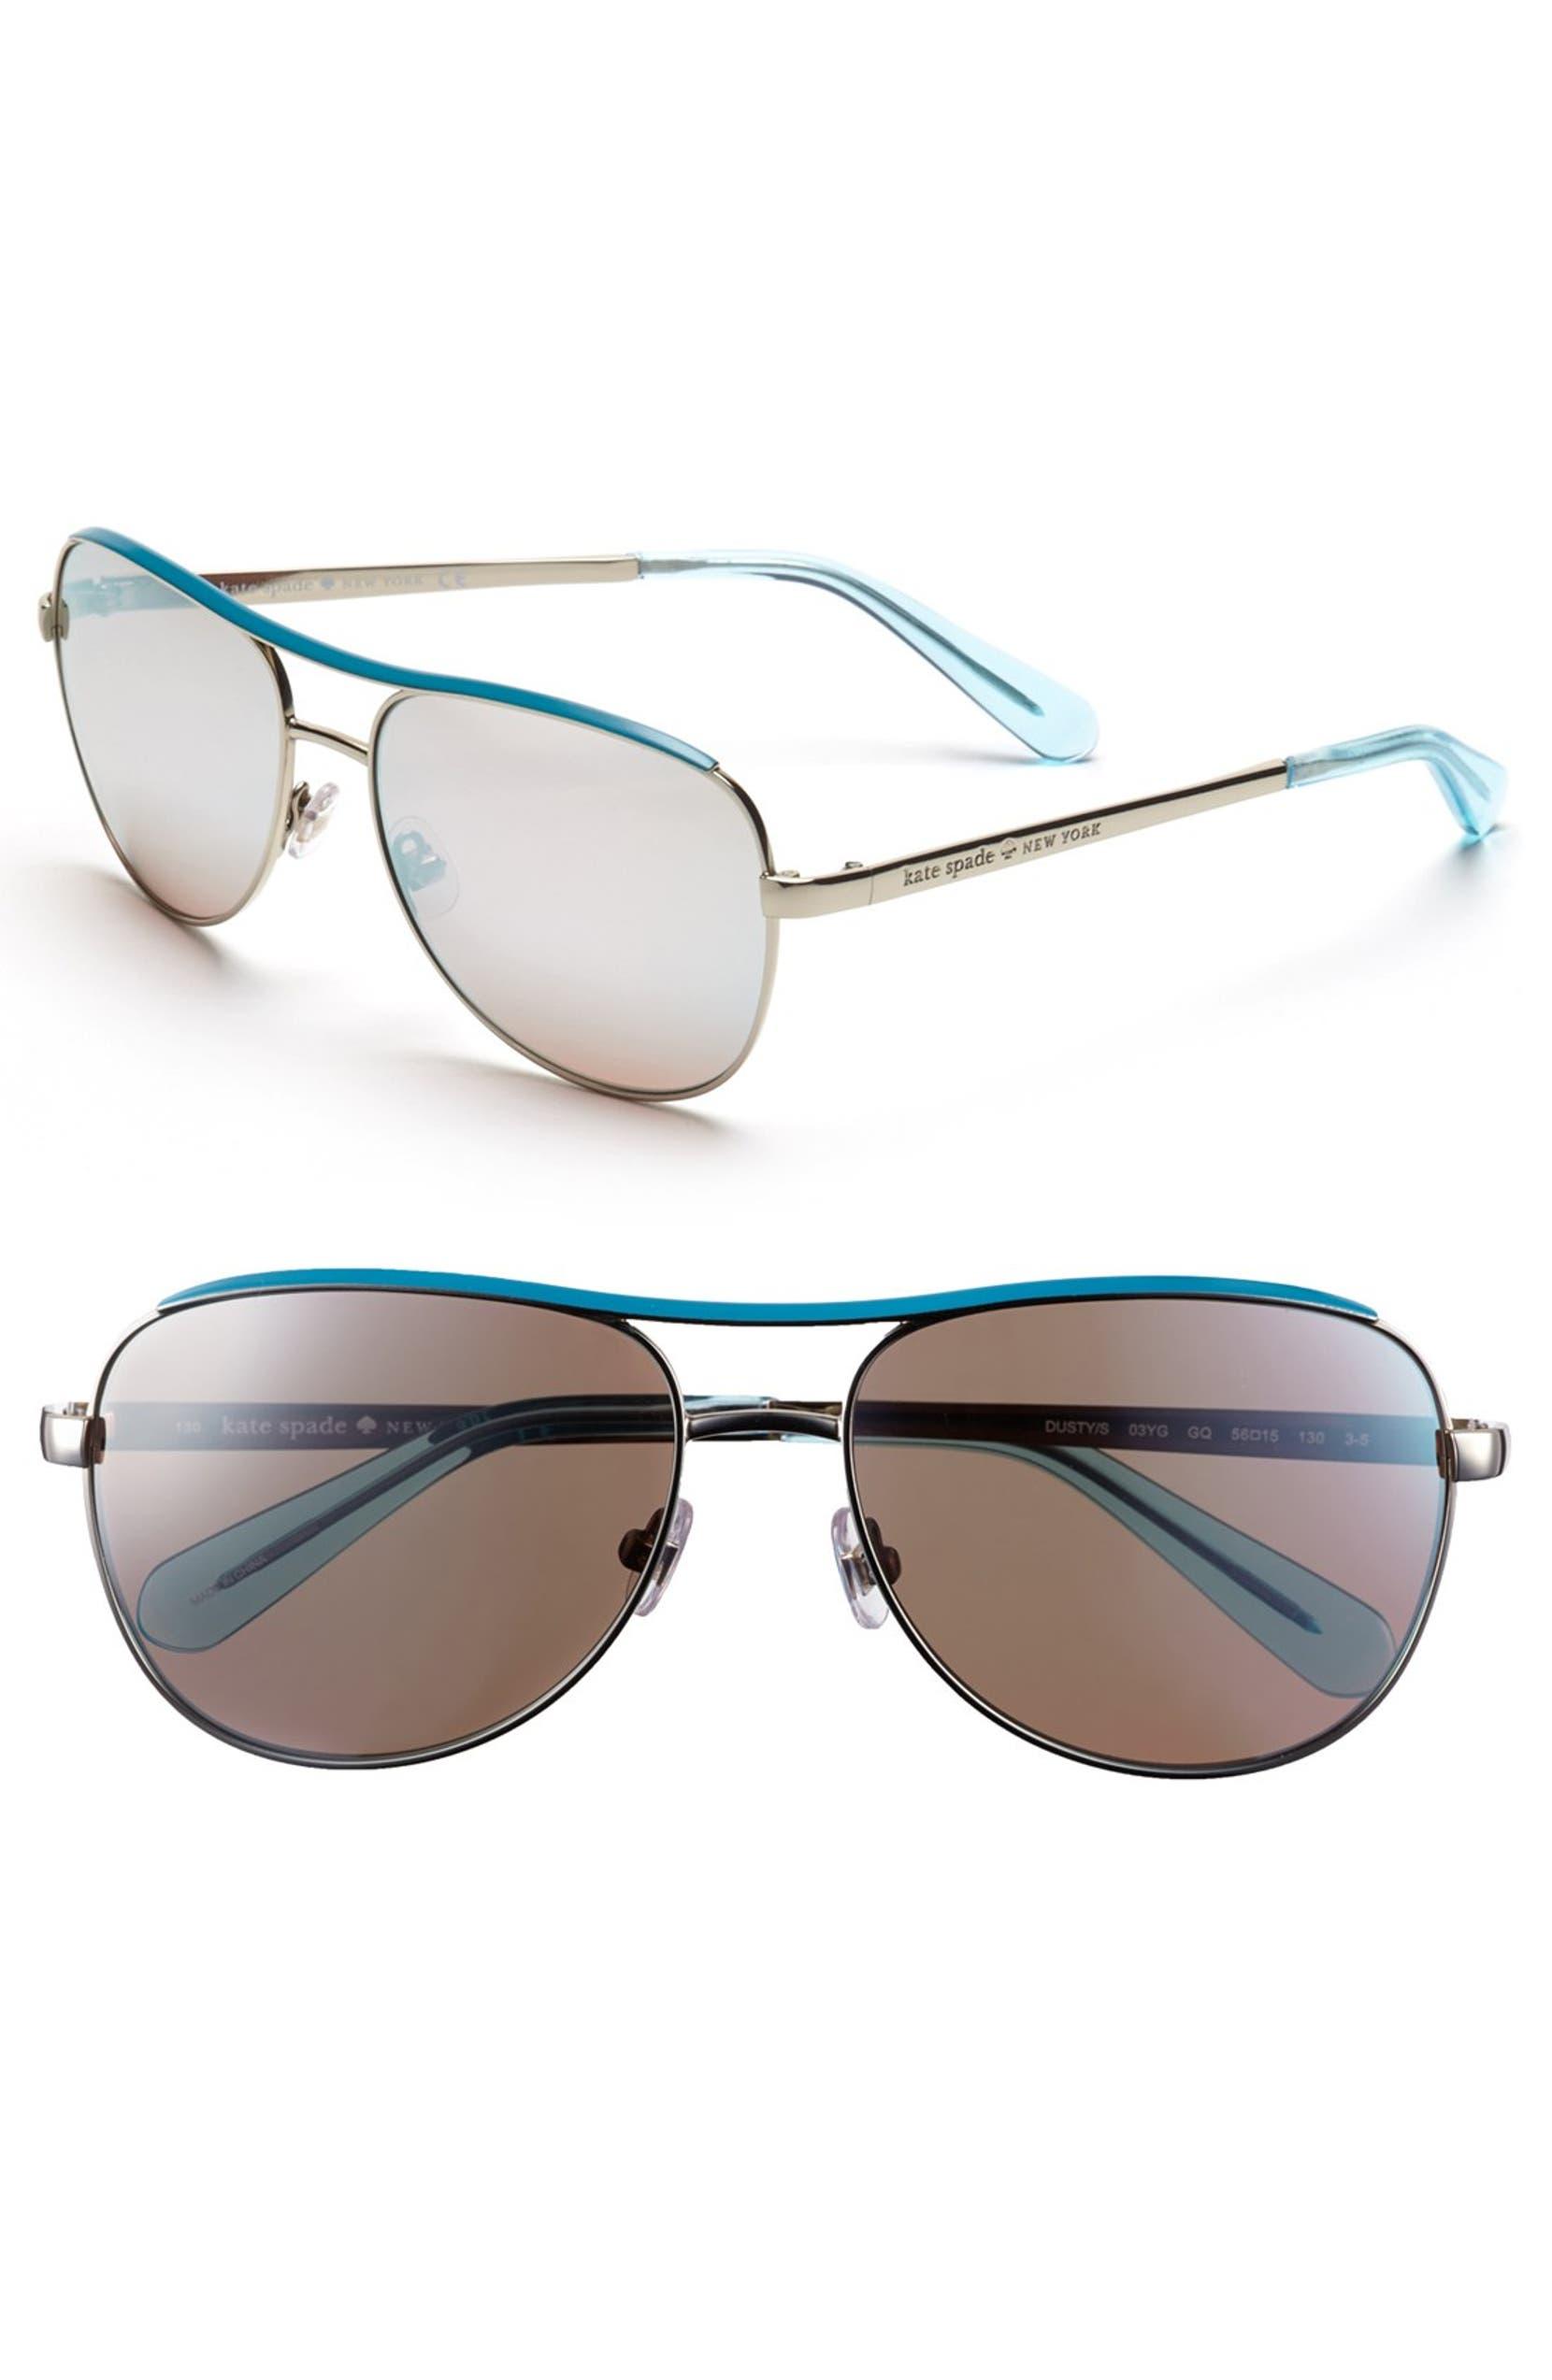 16cc5d8e07 kate spade new york  dusty  56mm metal aviator sunglasses